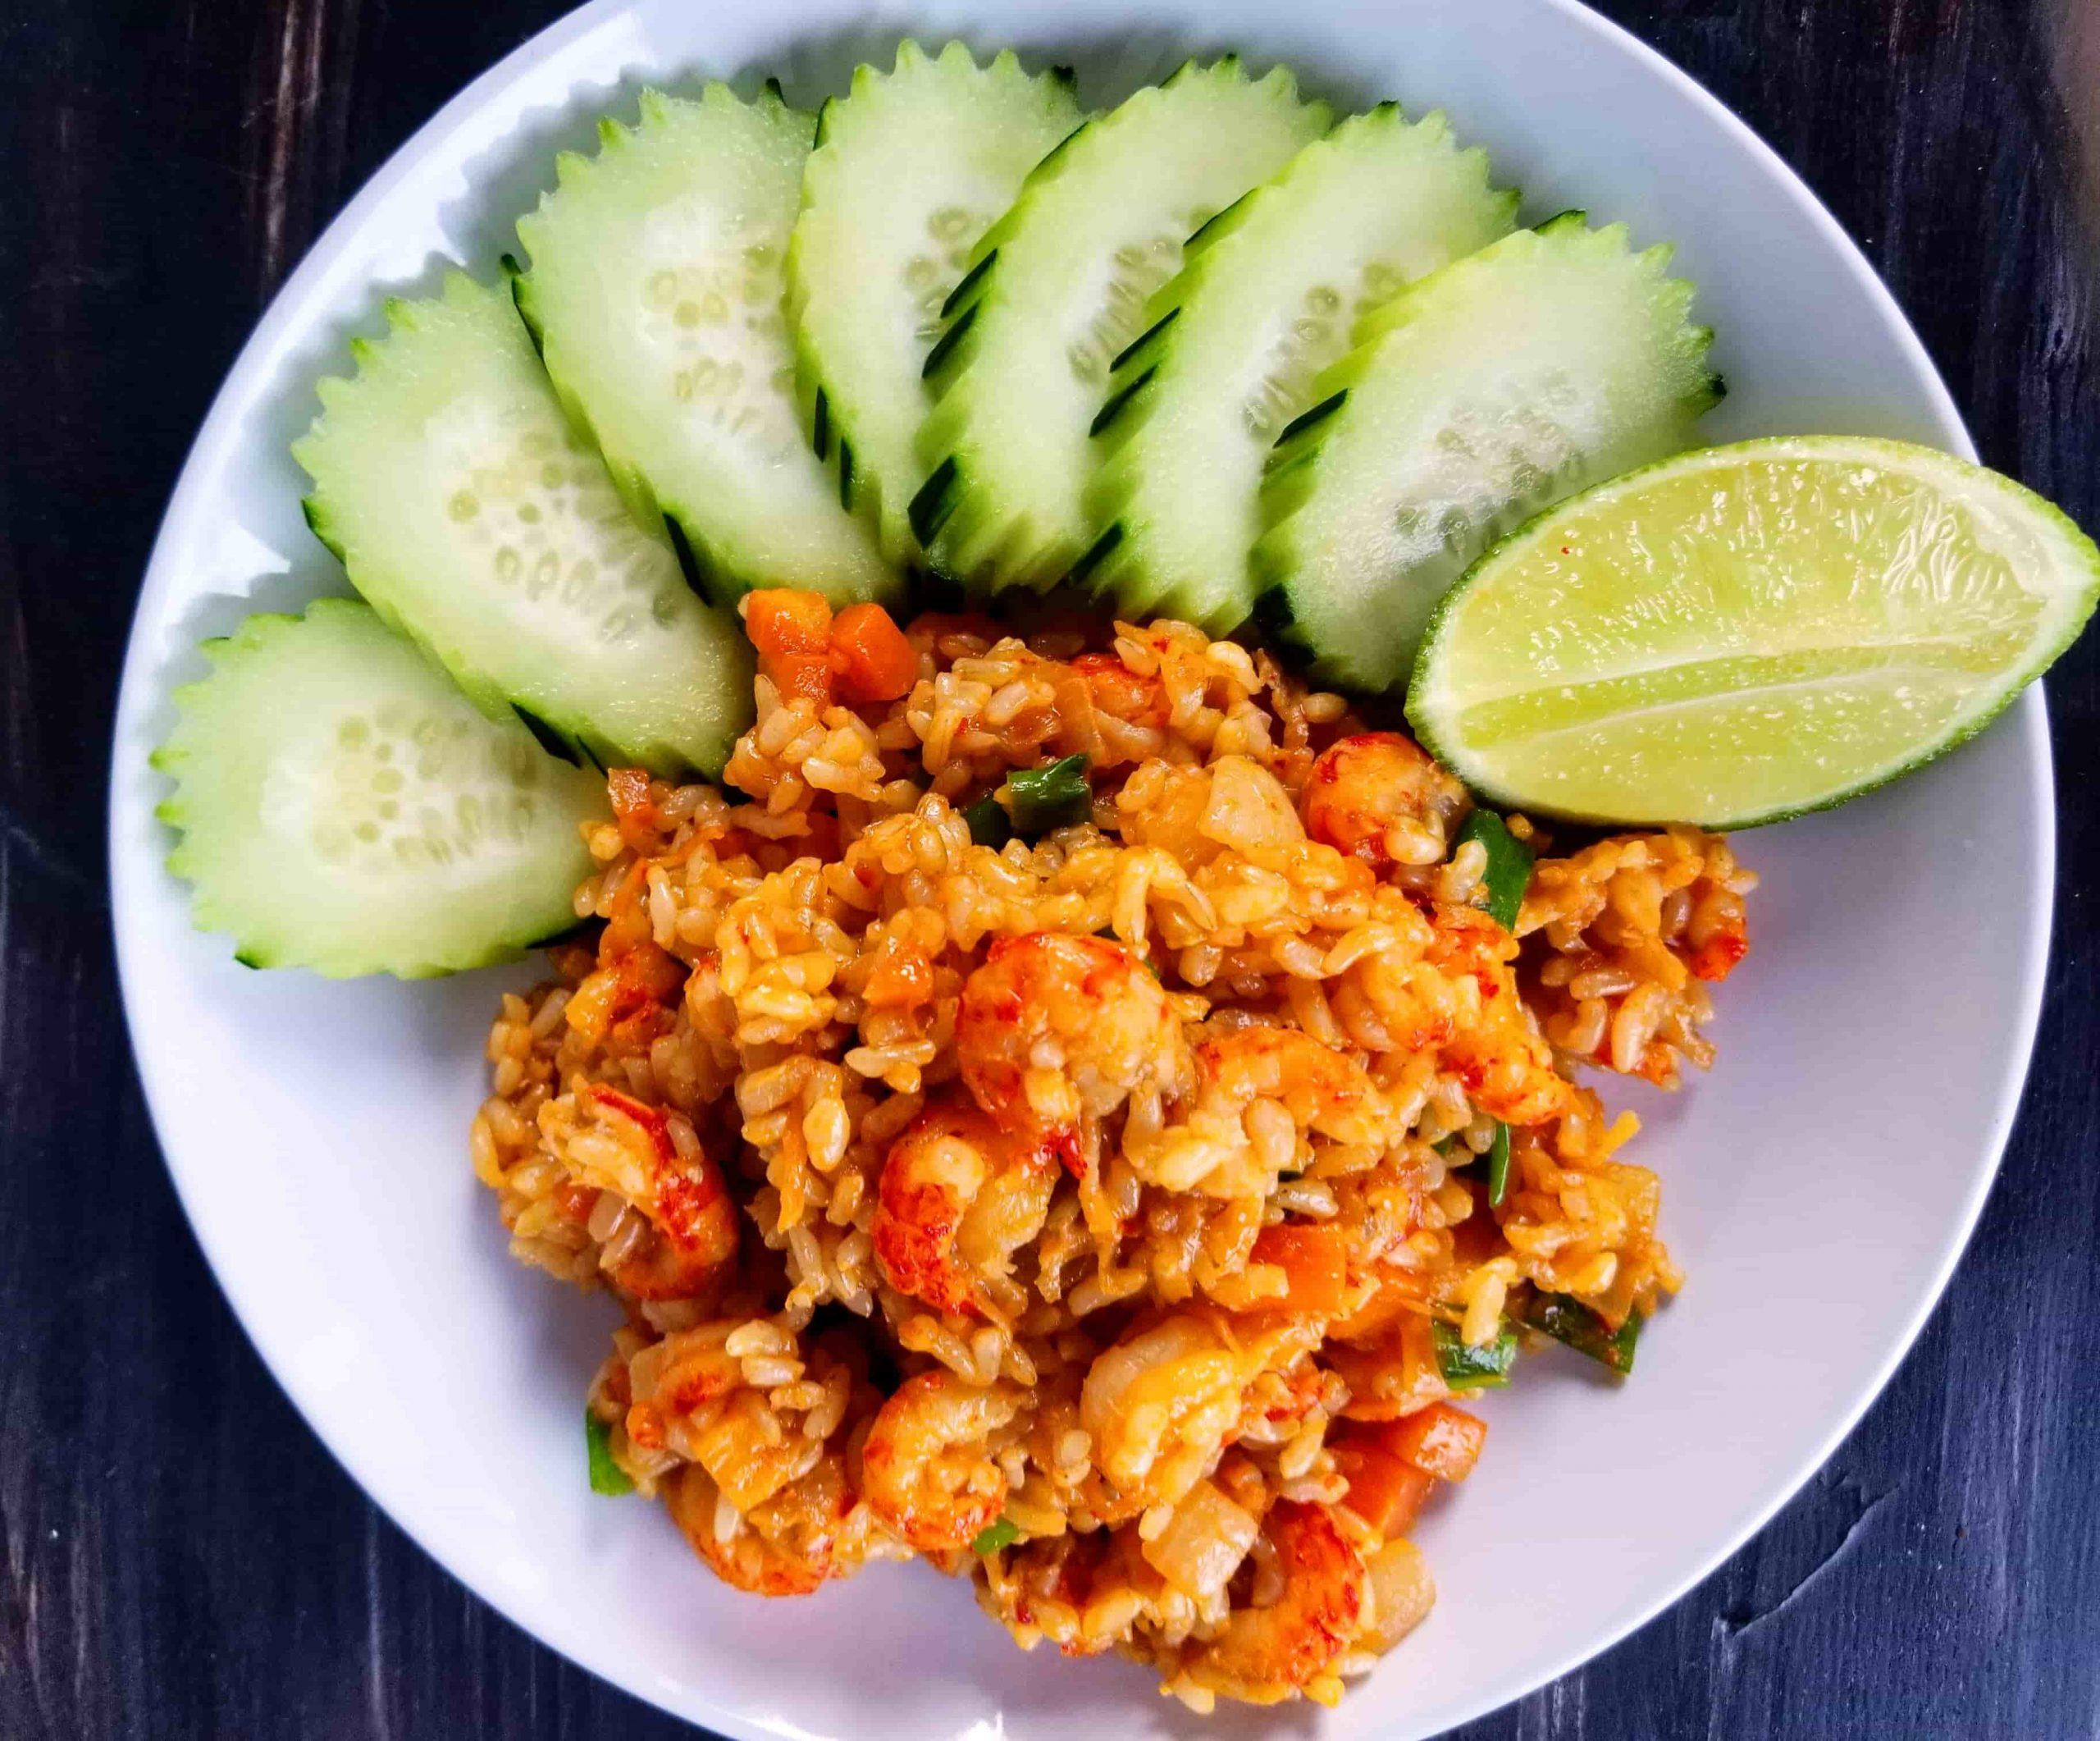 Crawfish Fried Rice, using brown rice - Healthy Thai Recipe